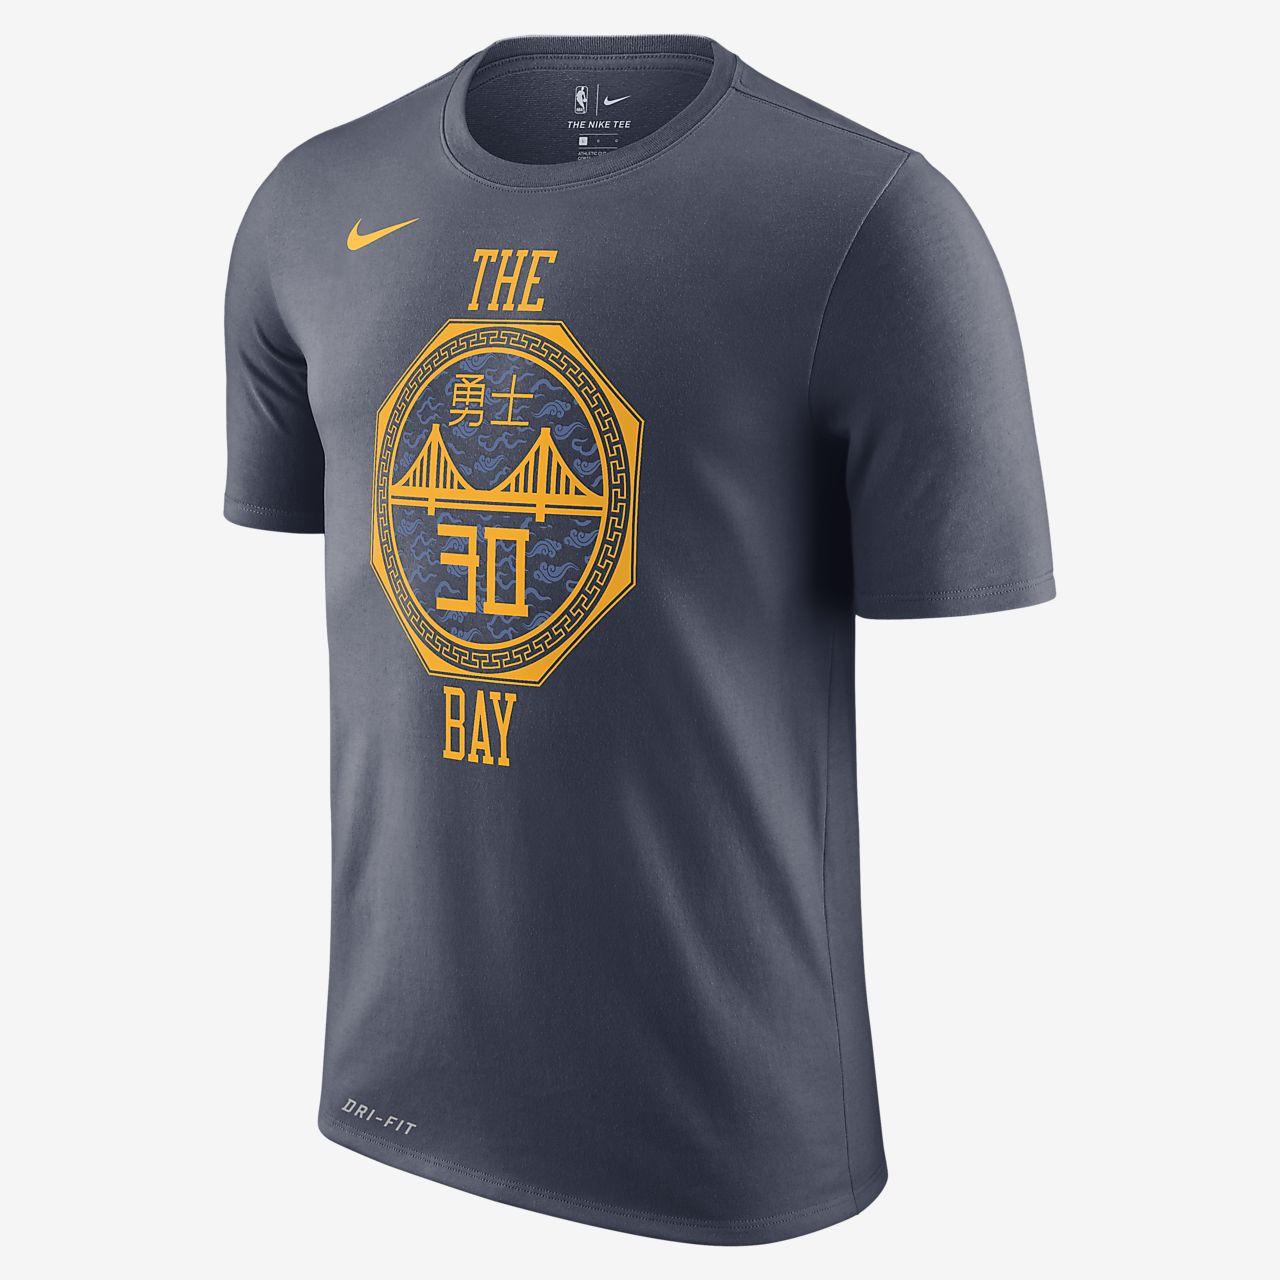 9d6c66f5a Stephen Curry Golden State Warriors City Edition Nike Dri-FIT Men s NBA T- Shirt